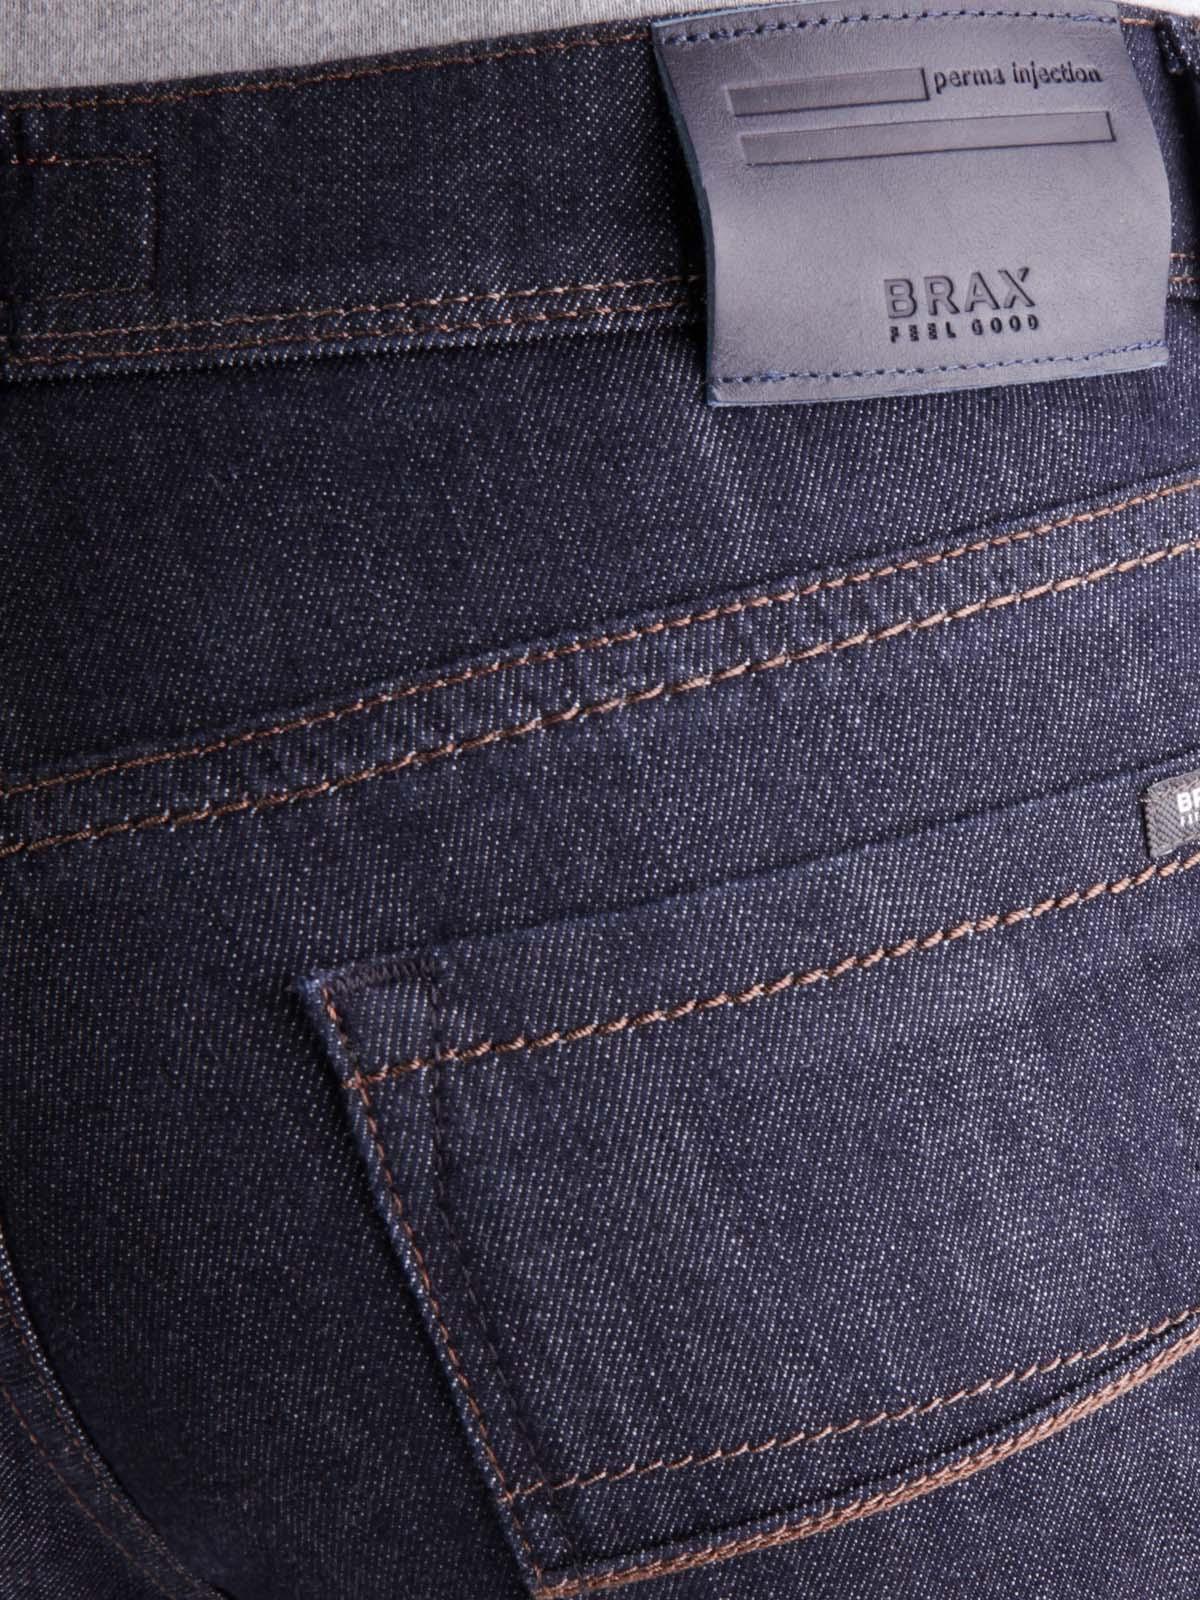 dirt cheap preview of united kingdom Brax Cadiz Jeans perma indigo